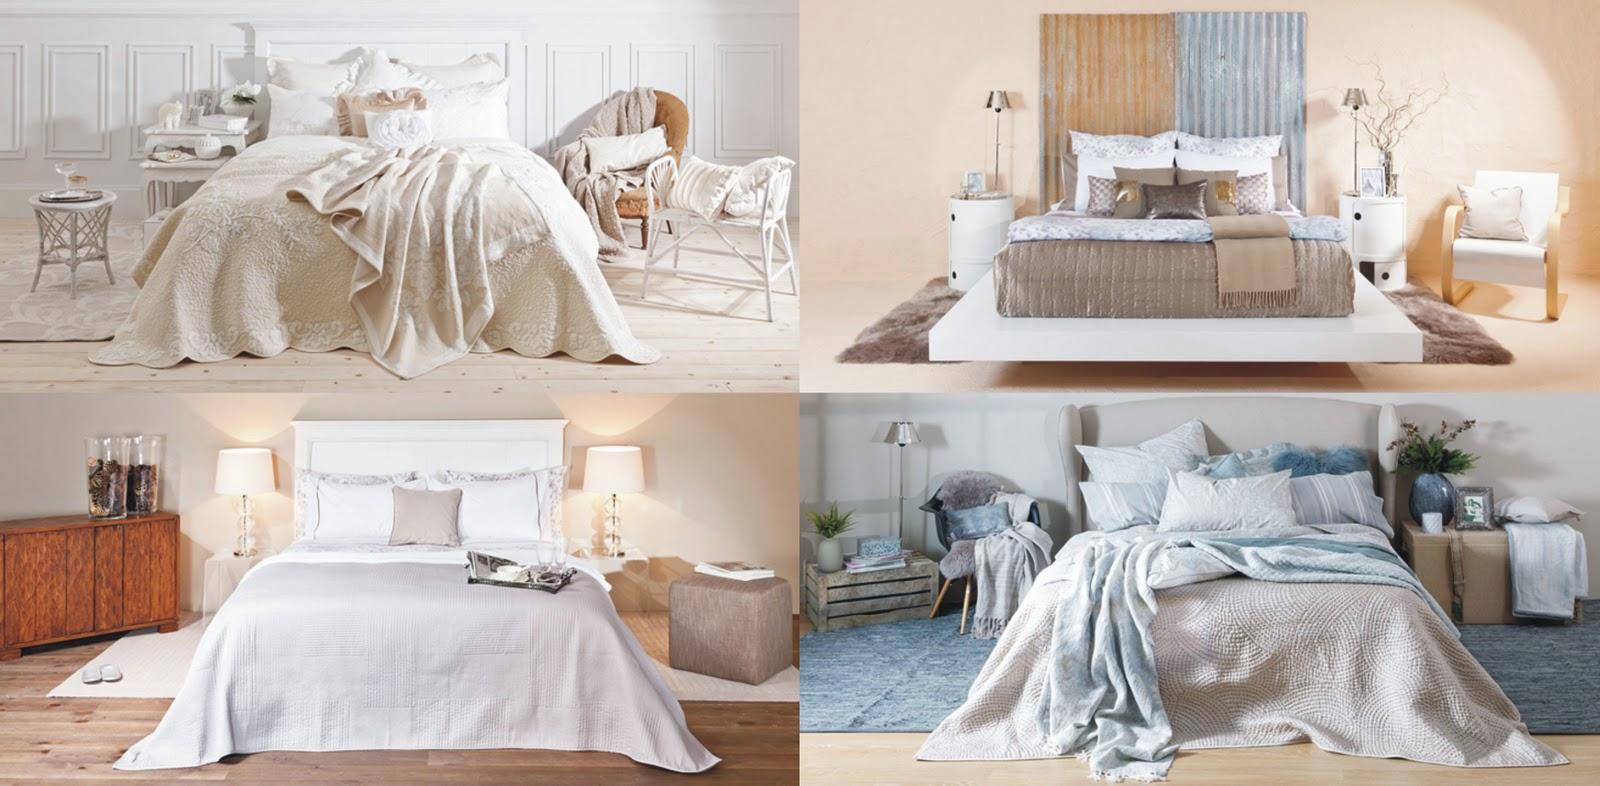 Decorole adquisiciones ropa de cama zara home - Ropa de cama zara home ...